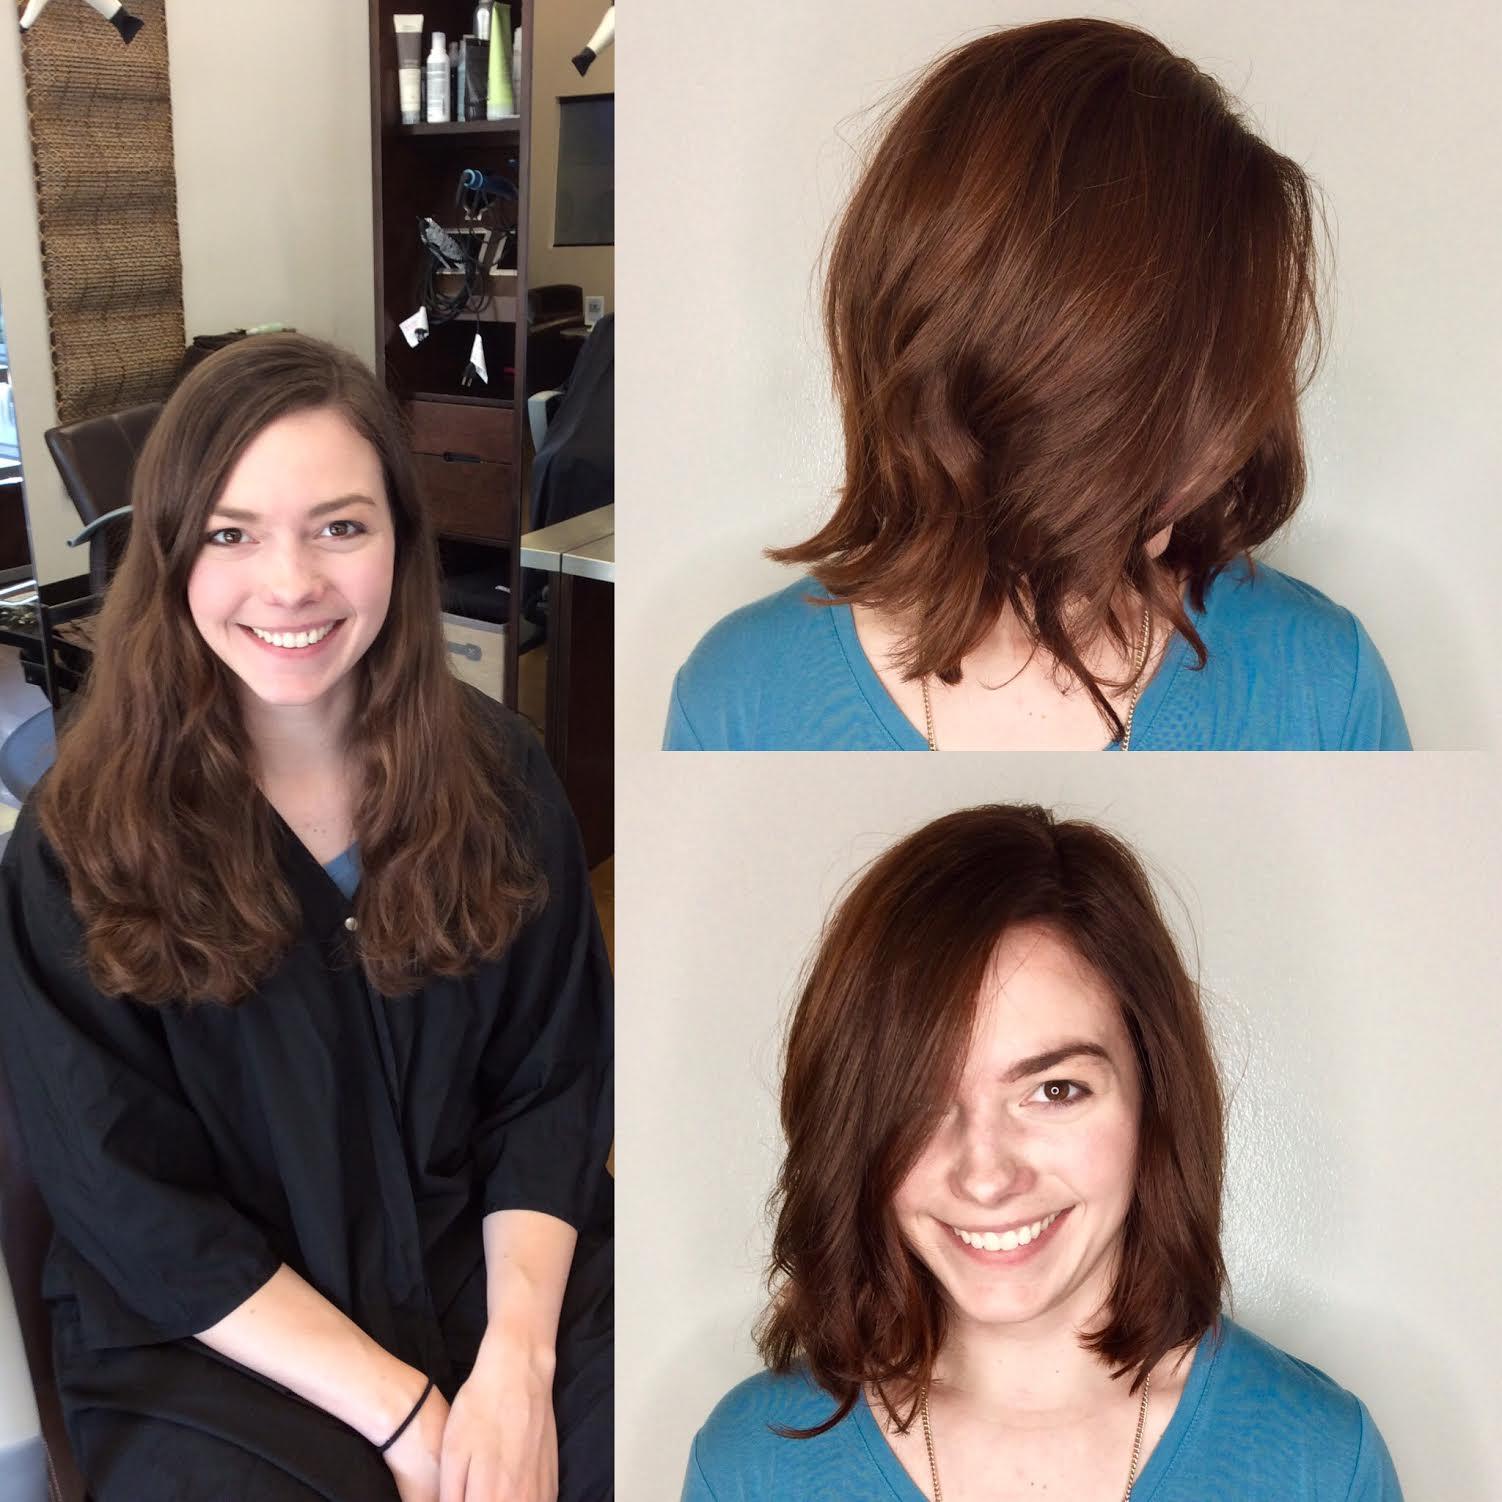 Kari Wawrzonek Frisco Hairstylist Transformation Haircut